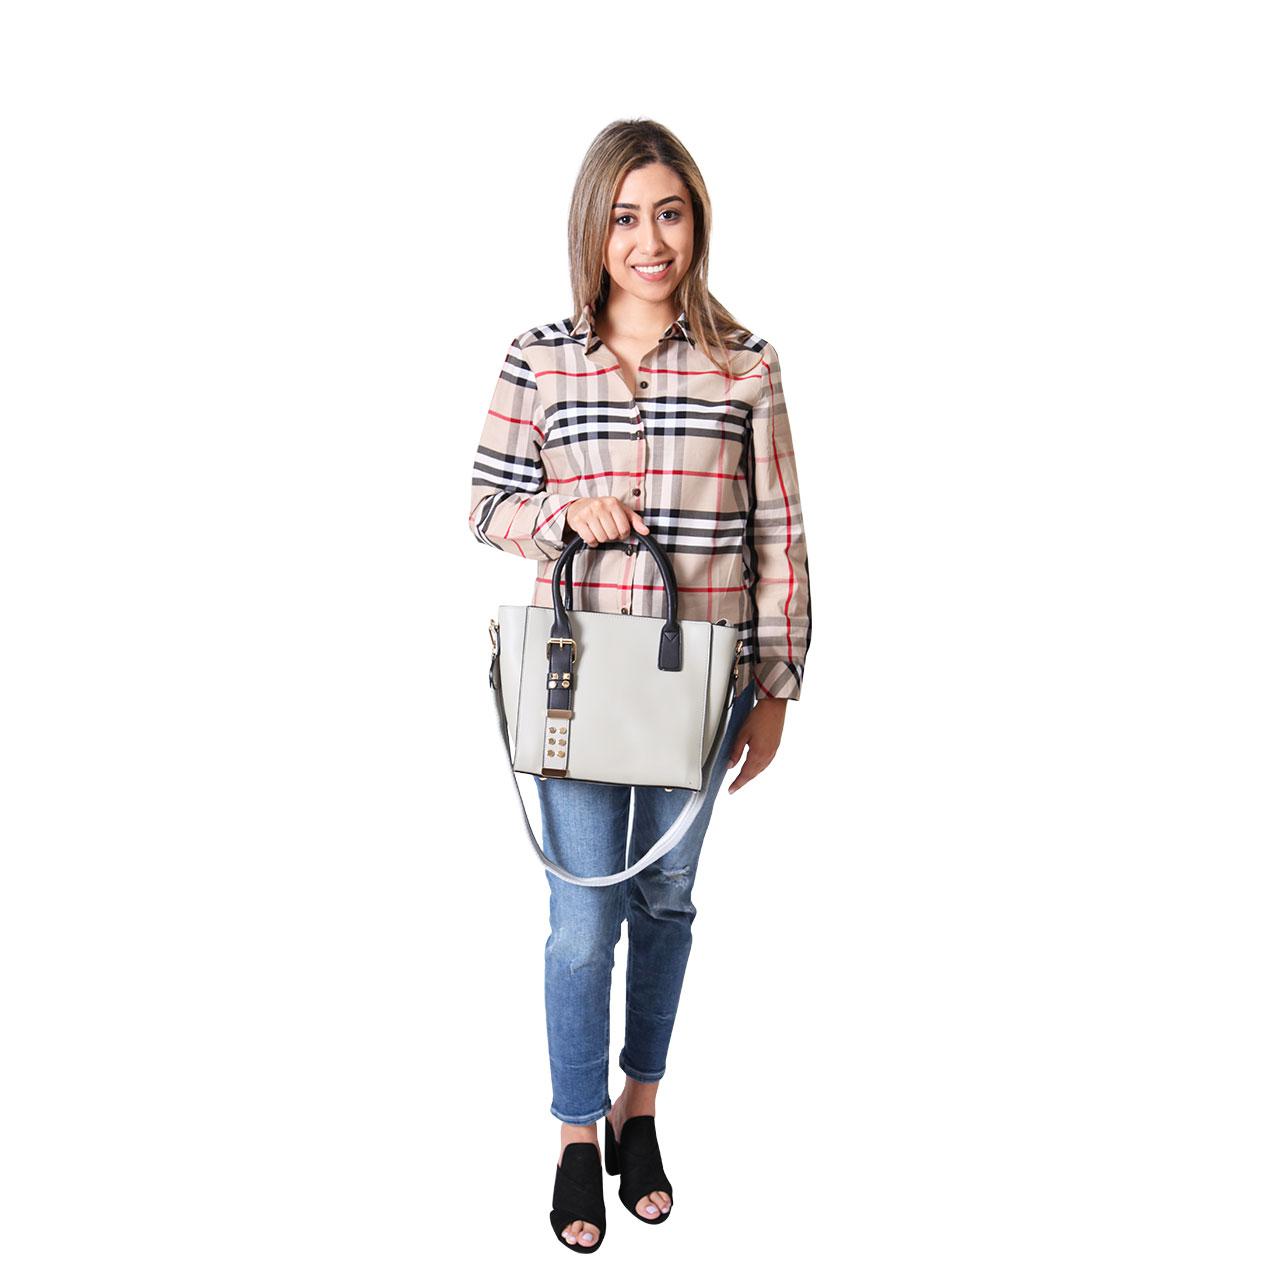 Women Multi-Color Plaid Flannel Long Sleeve Top Shirt